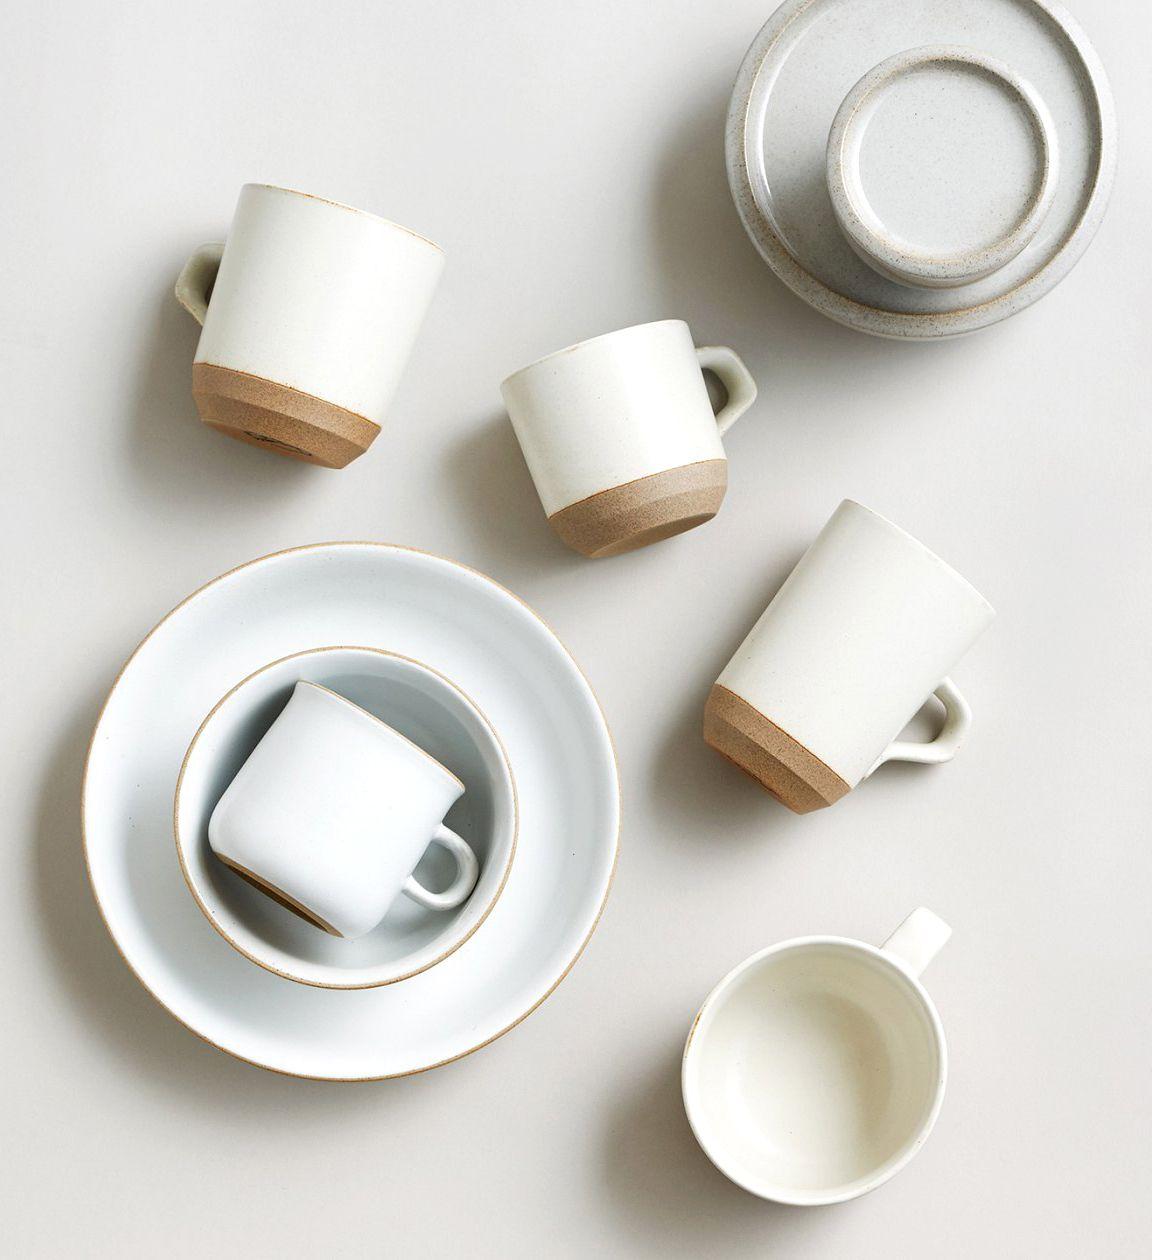 Kinto Ceramics And Tea Products Sarah Le Donne Blog Ceramic Tableware Ceramic Dinnerware Ceramics